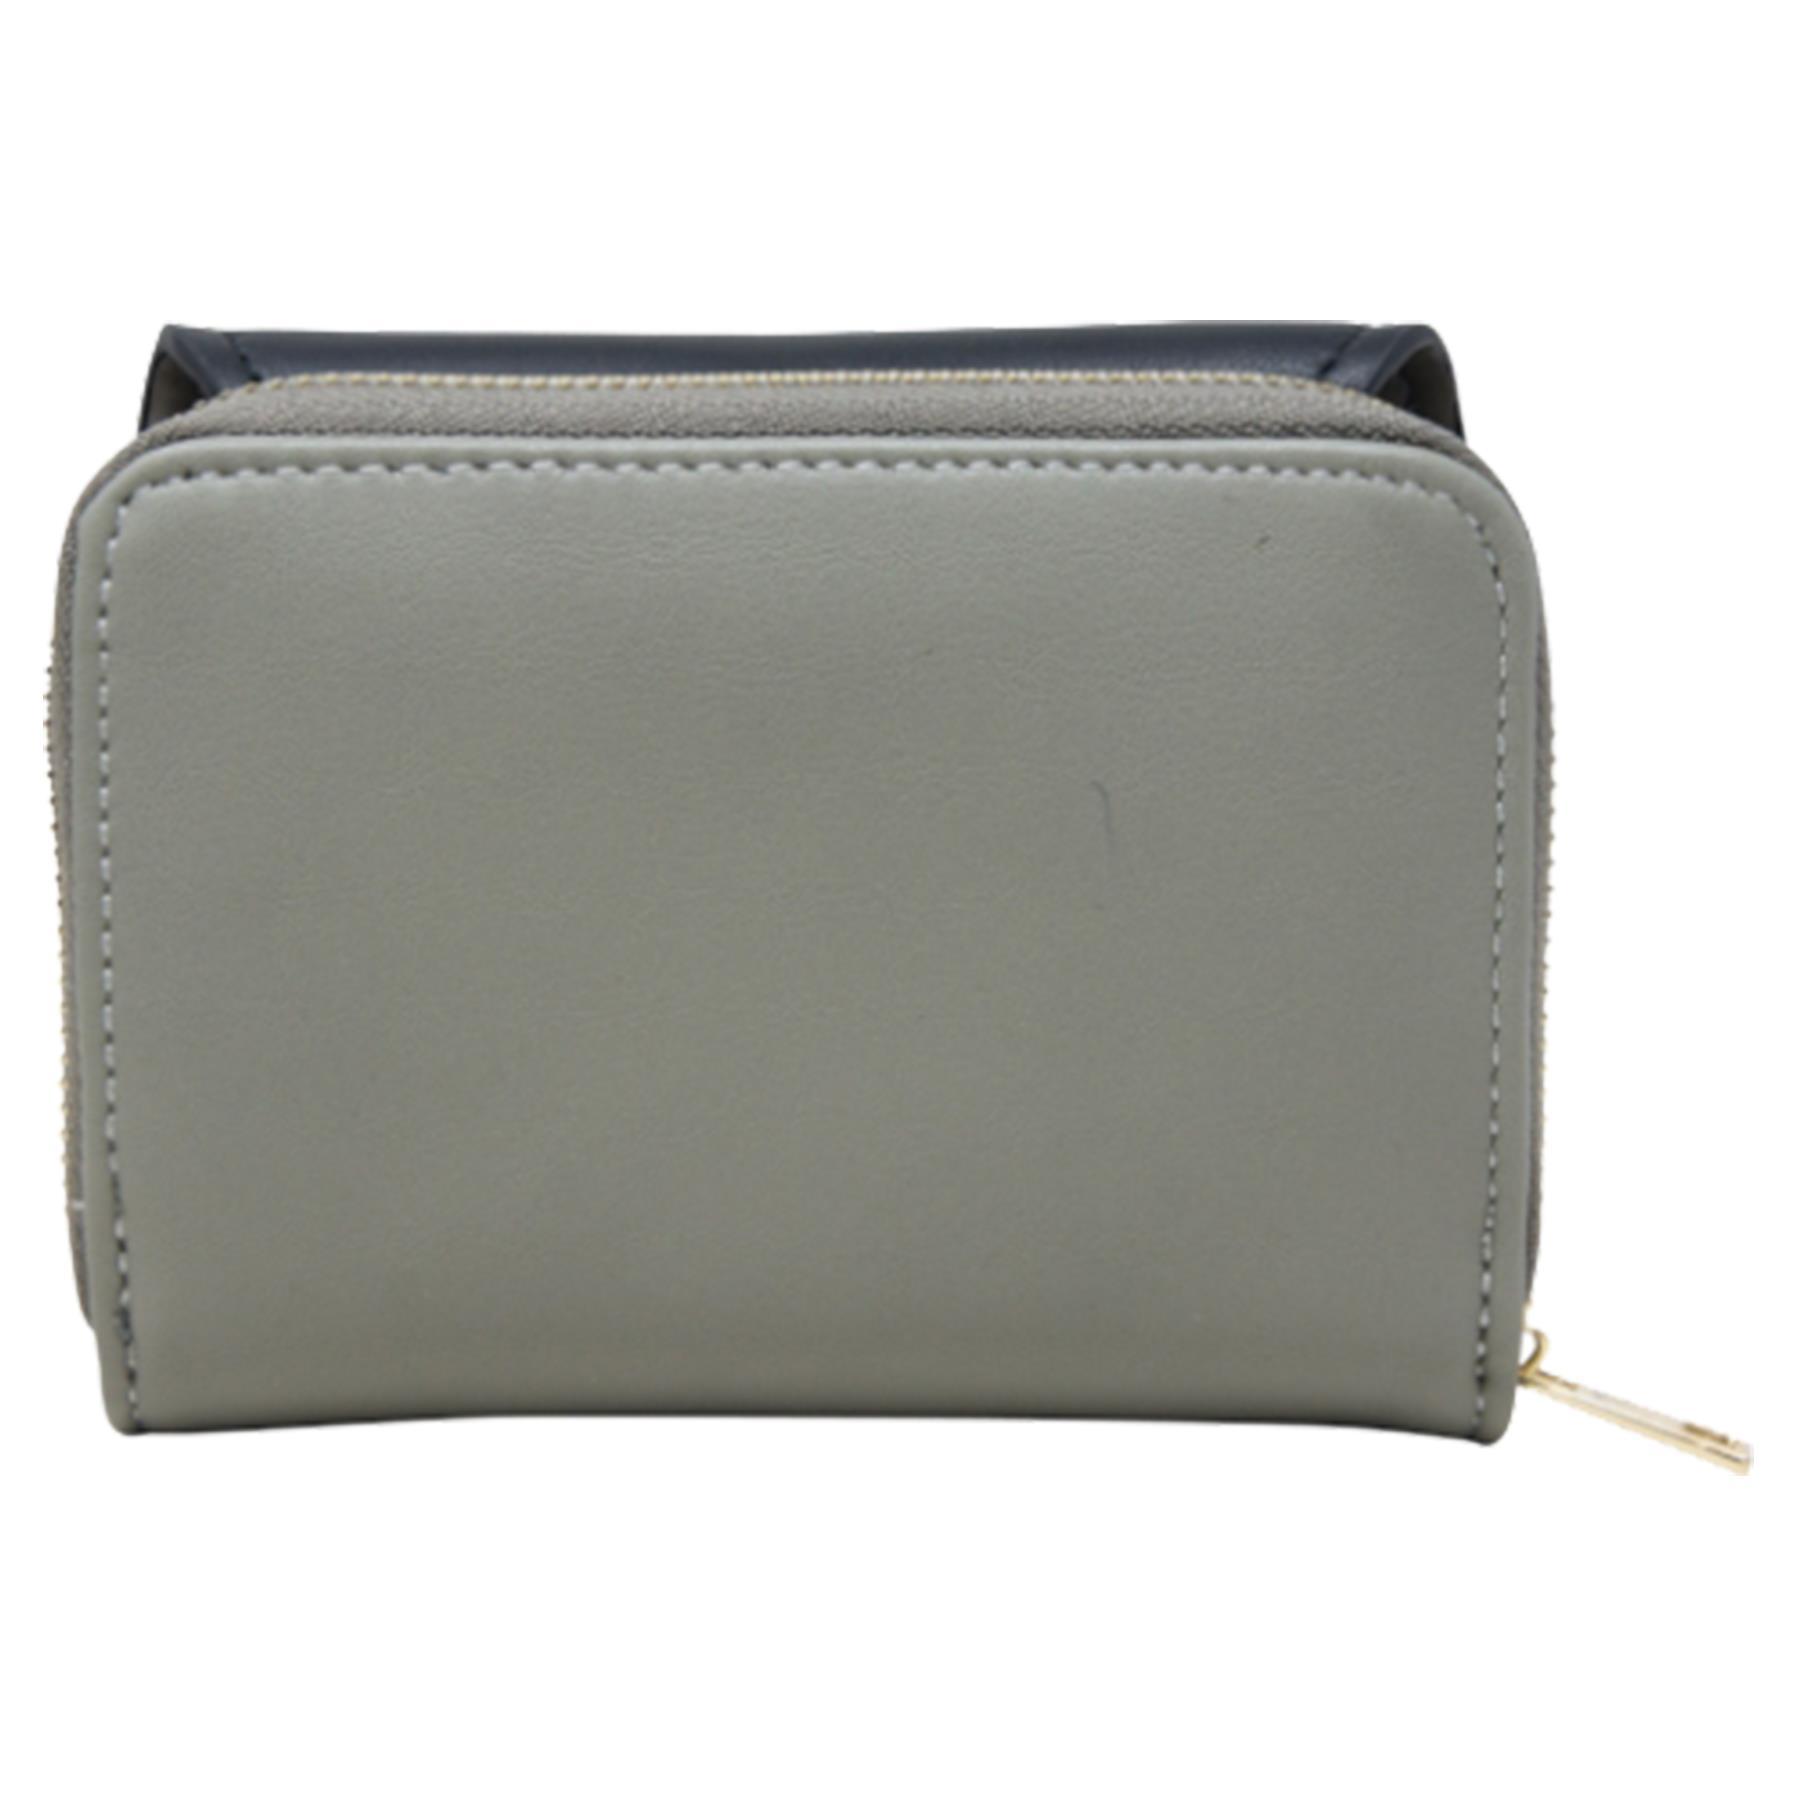 New-Ladies-Multicoloured-Envelope-Faux-Leather-Reptile-Detail-Purse thumbnail 20